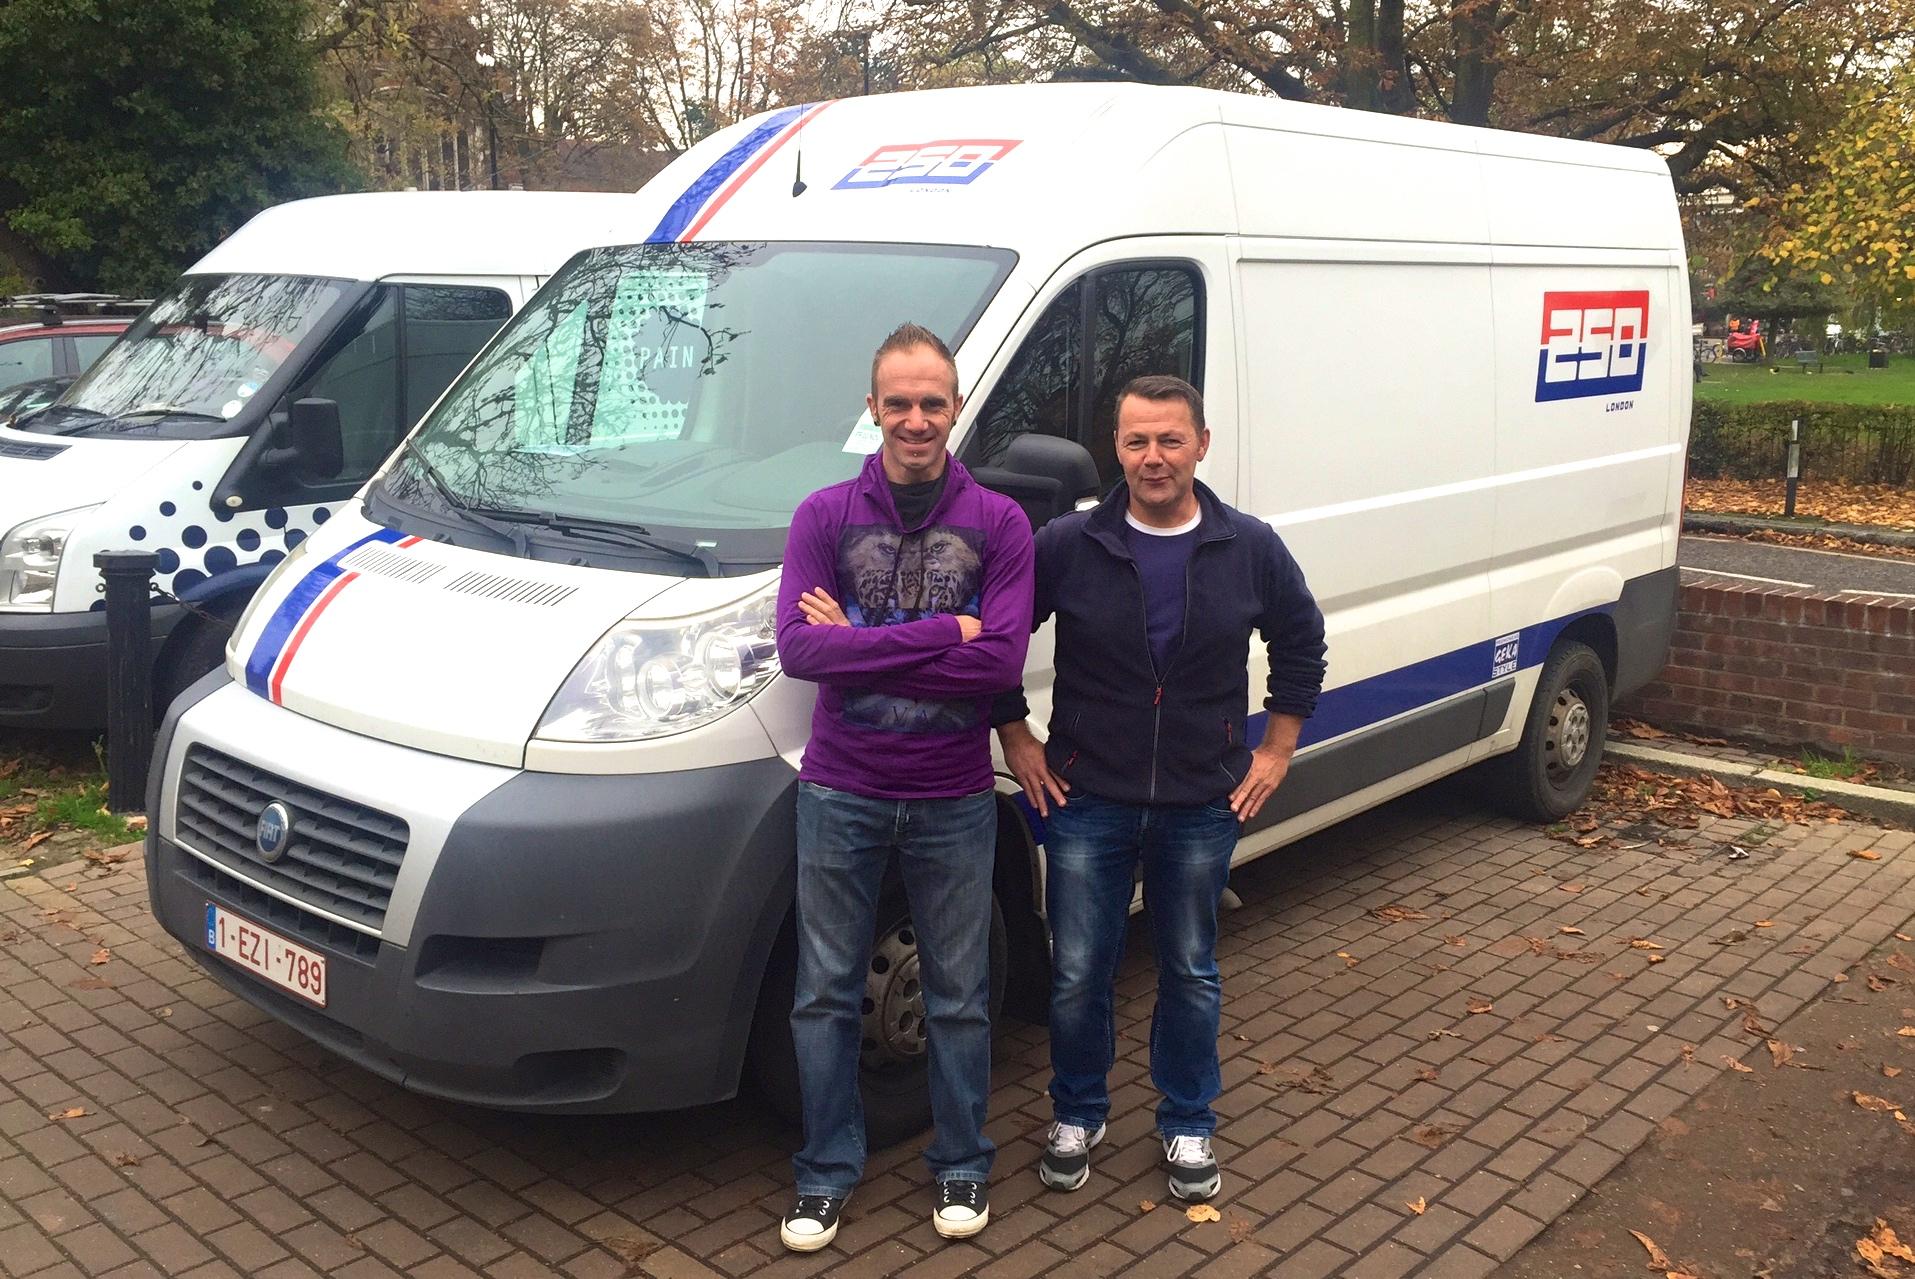 David Cools & Geert Gevers at 250London HQ picking up the stock this week. Nice Van!!